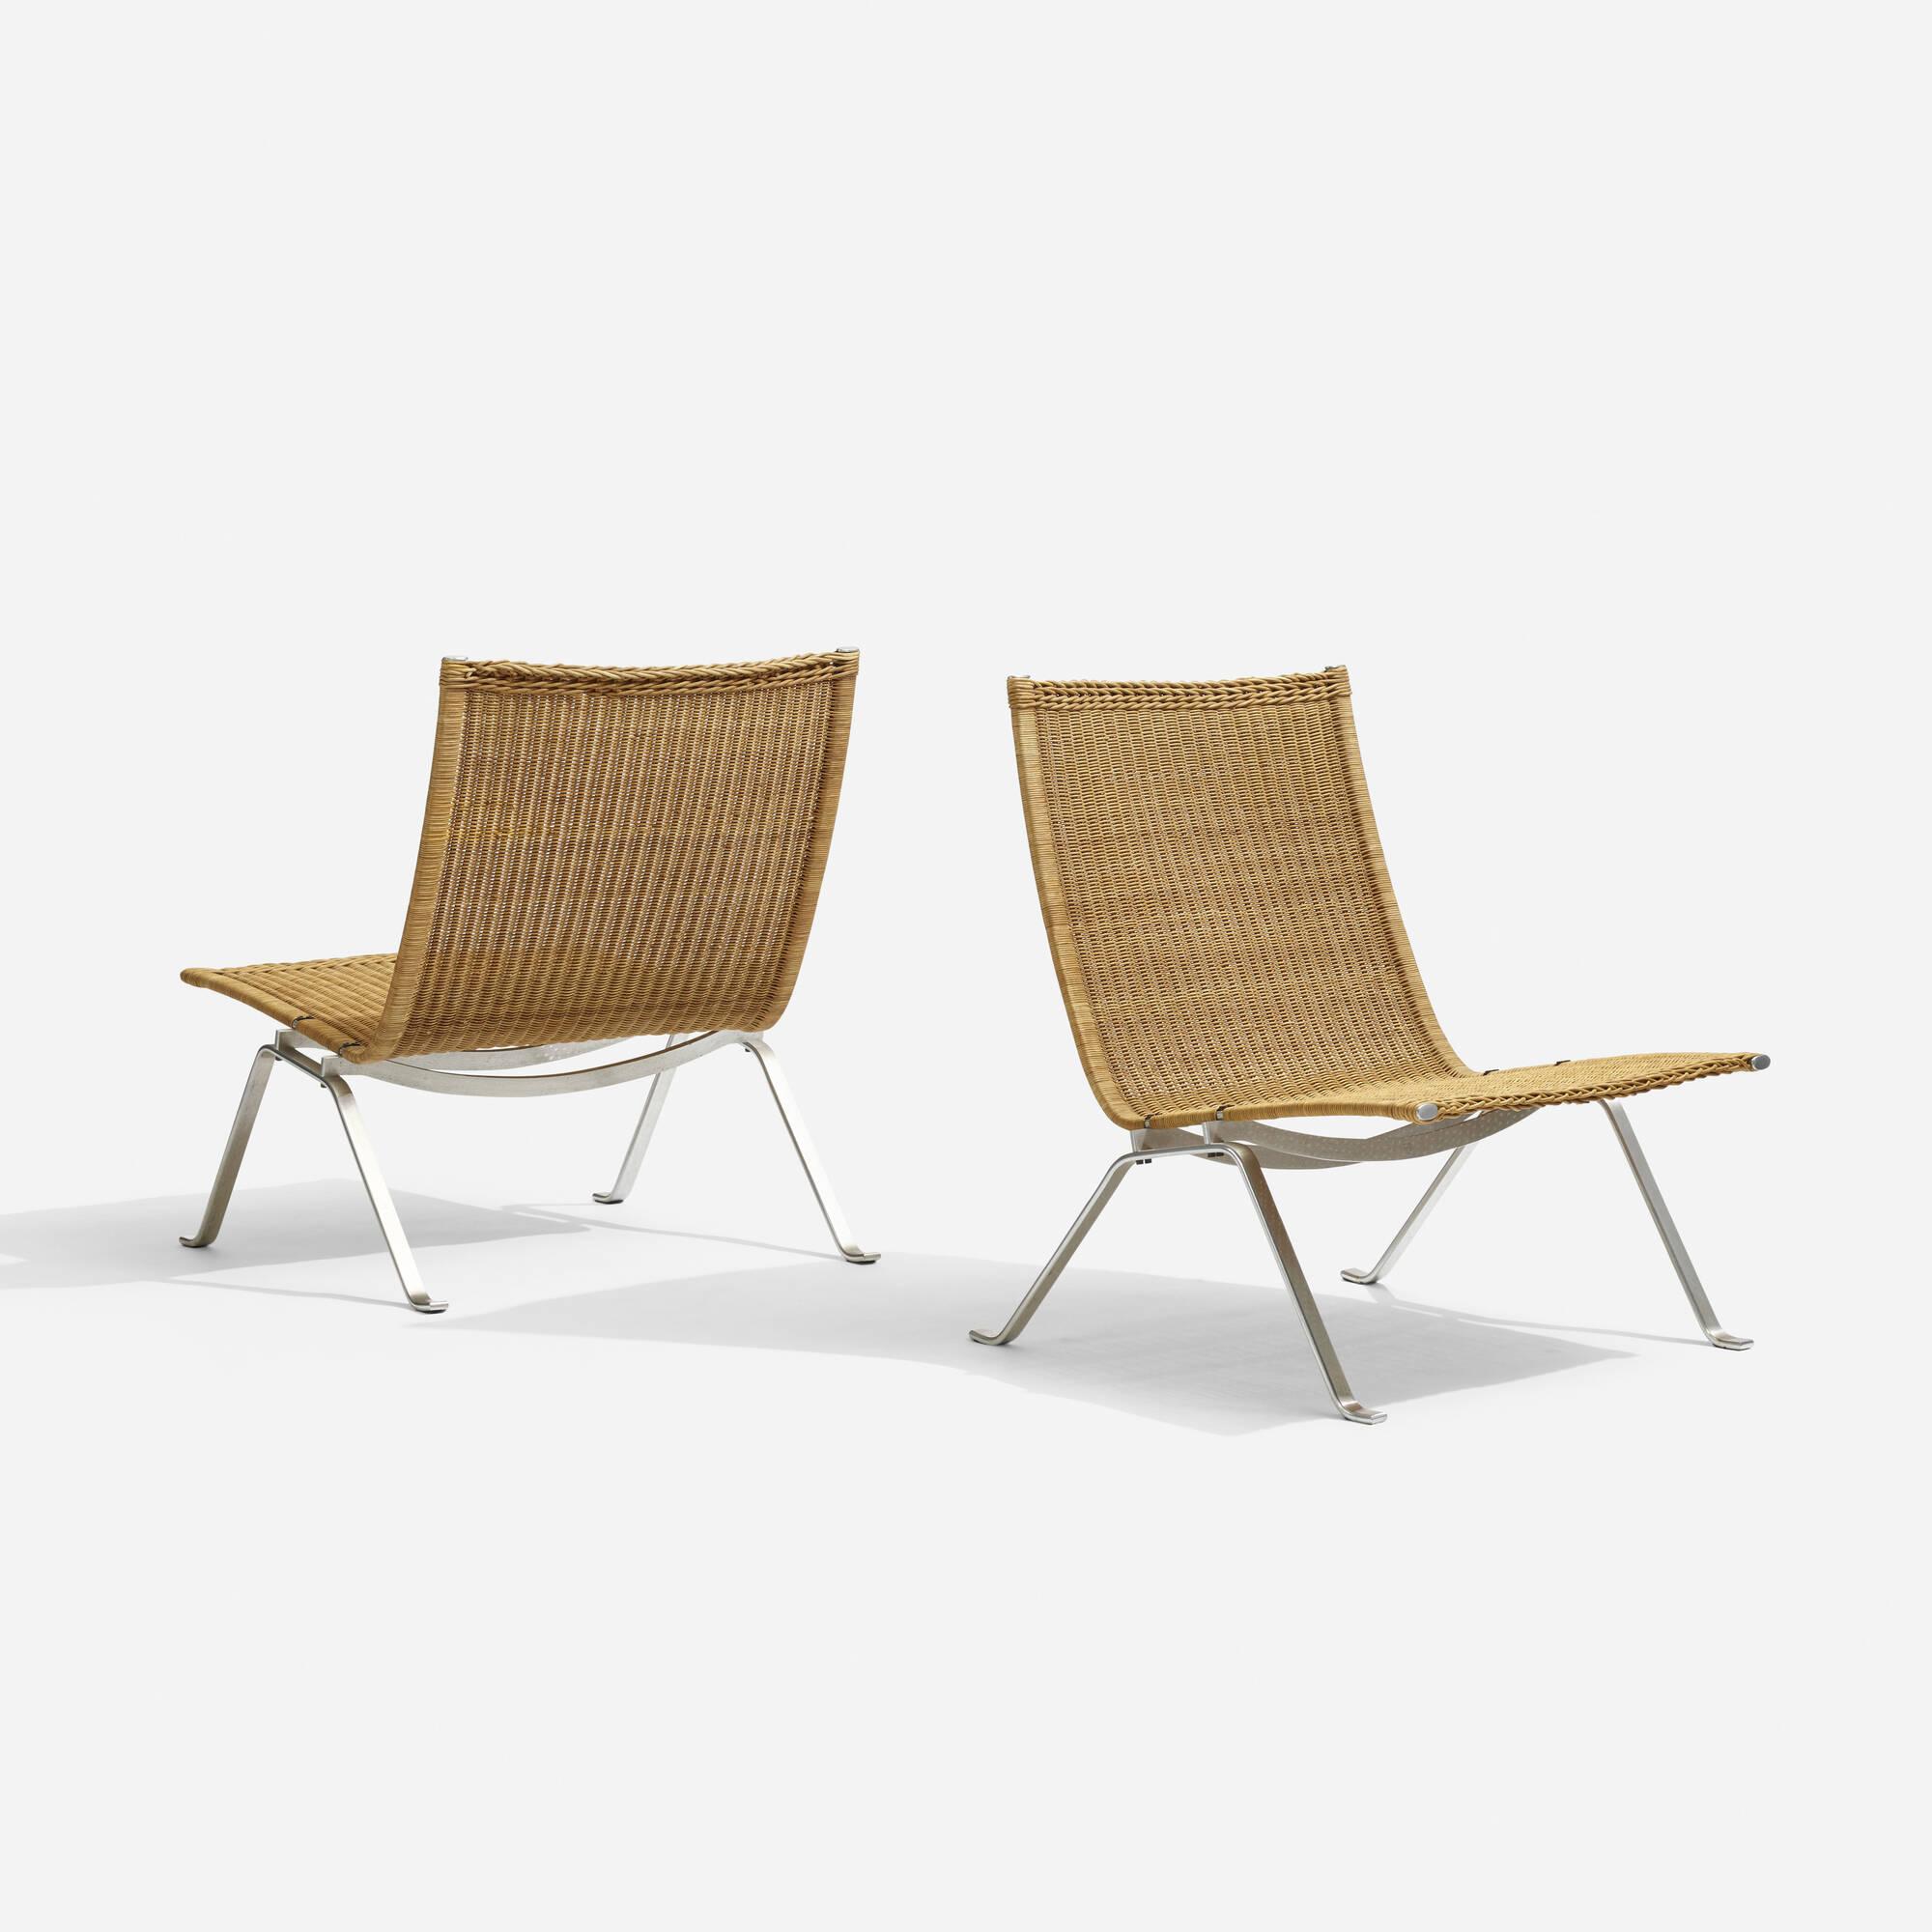 305: Poul Kjaerholm / PK-22 chairs, pair (1 of 4)